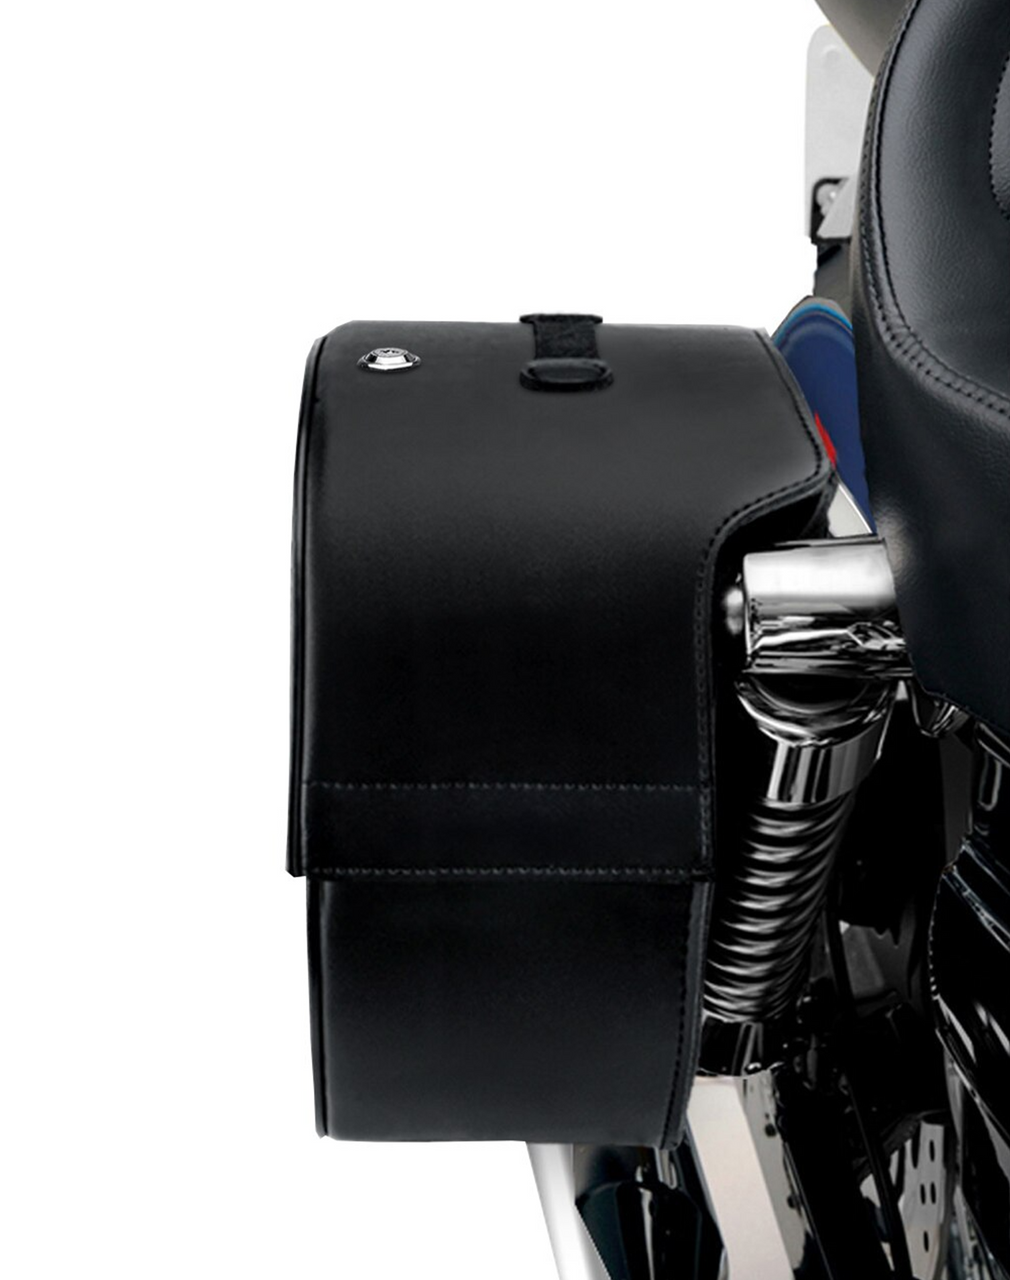 Viking Armor Shock Cutout Large Motorcycle Saddlebags For Harley Dyna Street Bob FXDB Shock Cutout View